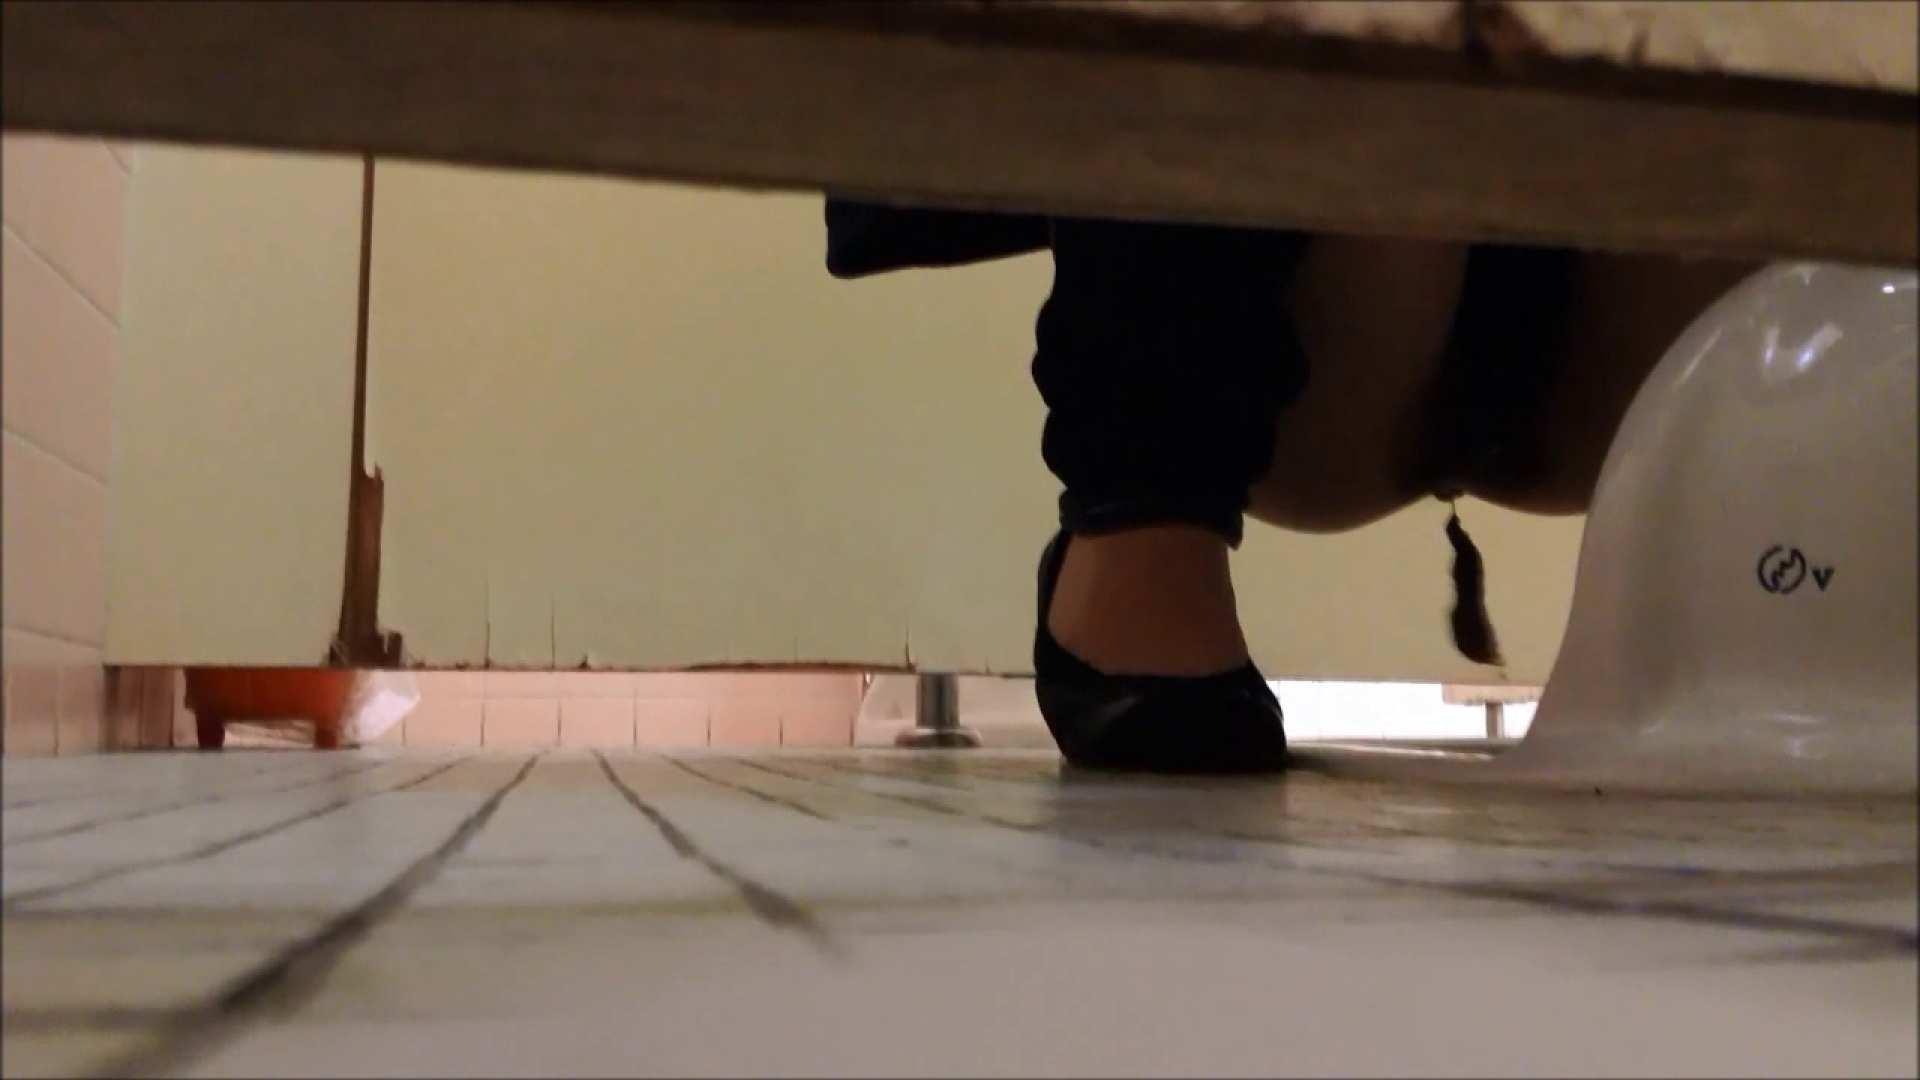 某有名大学女性洗面所 vol.06 OLのボディ オメコ無修正動画無料 74PIX 68